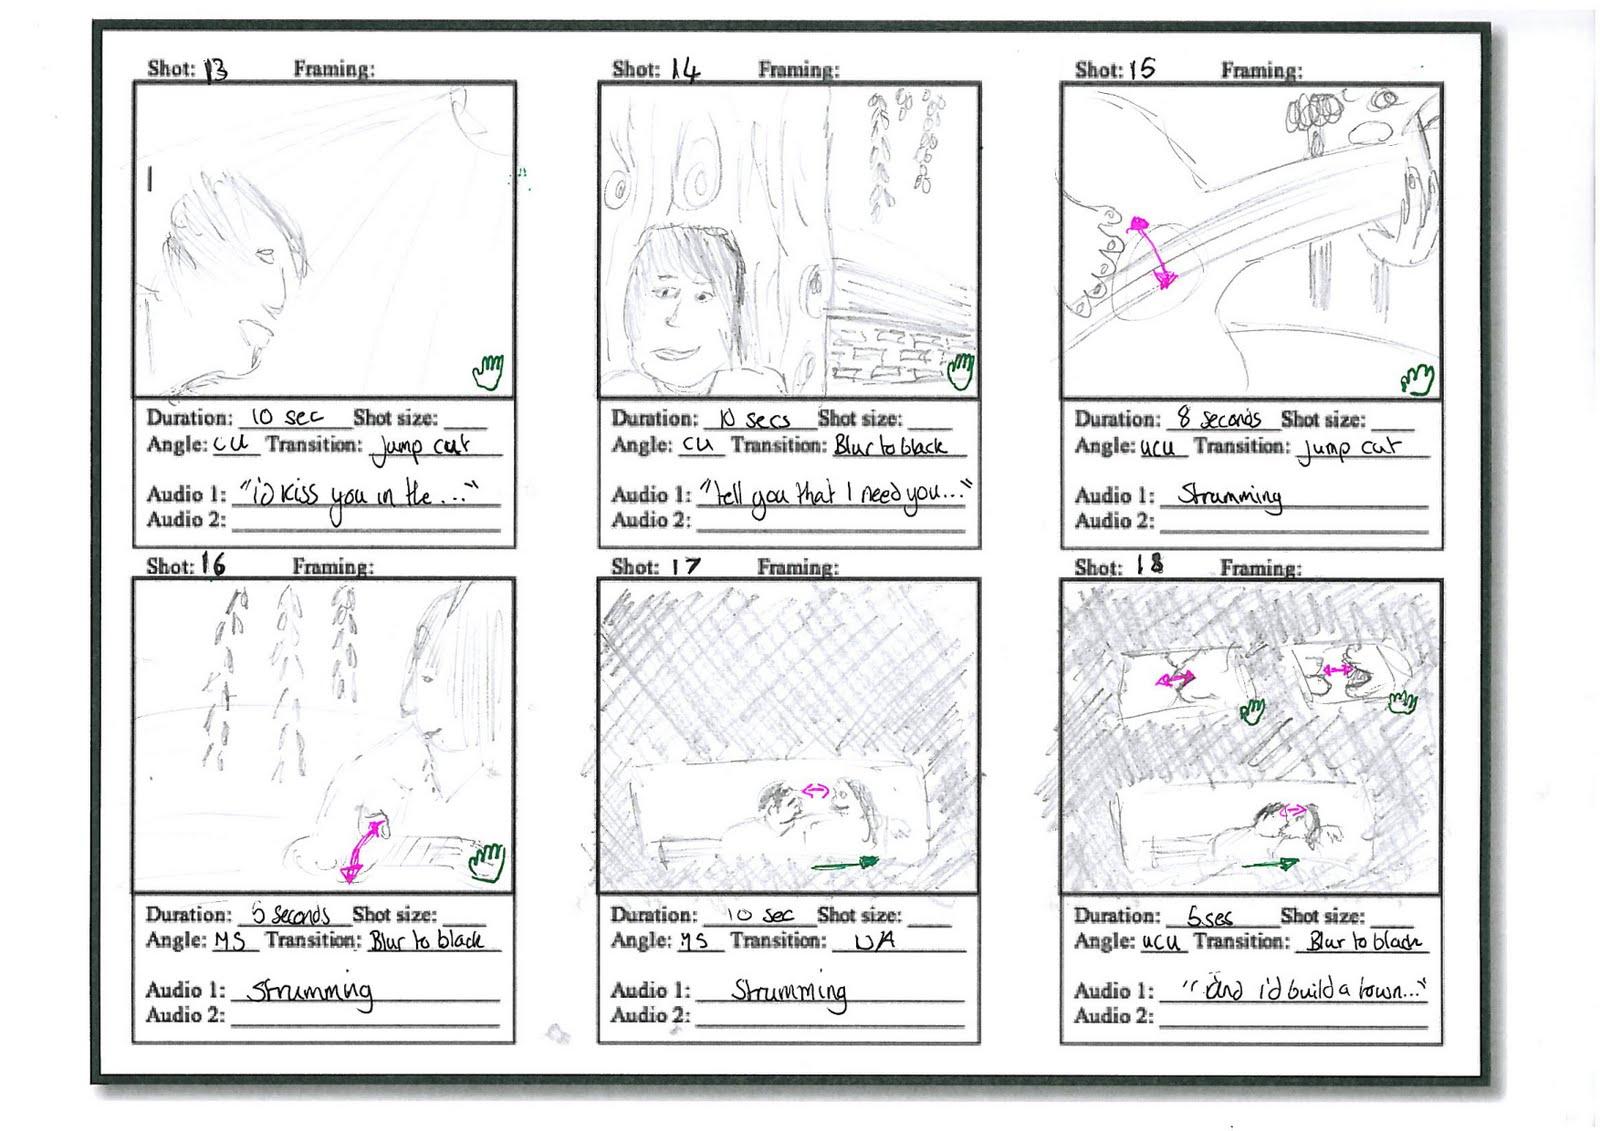 Kenny's Media Blog... Part 2: Initial Storyboard